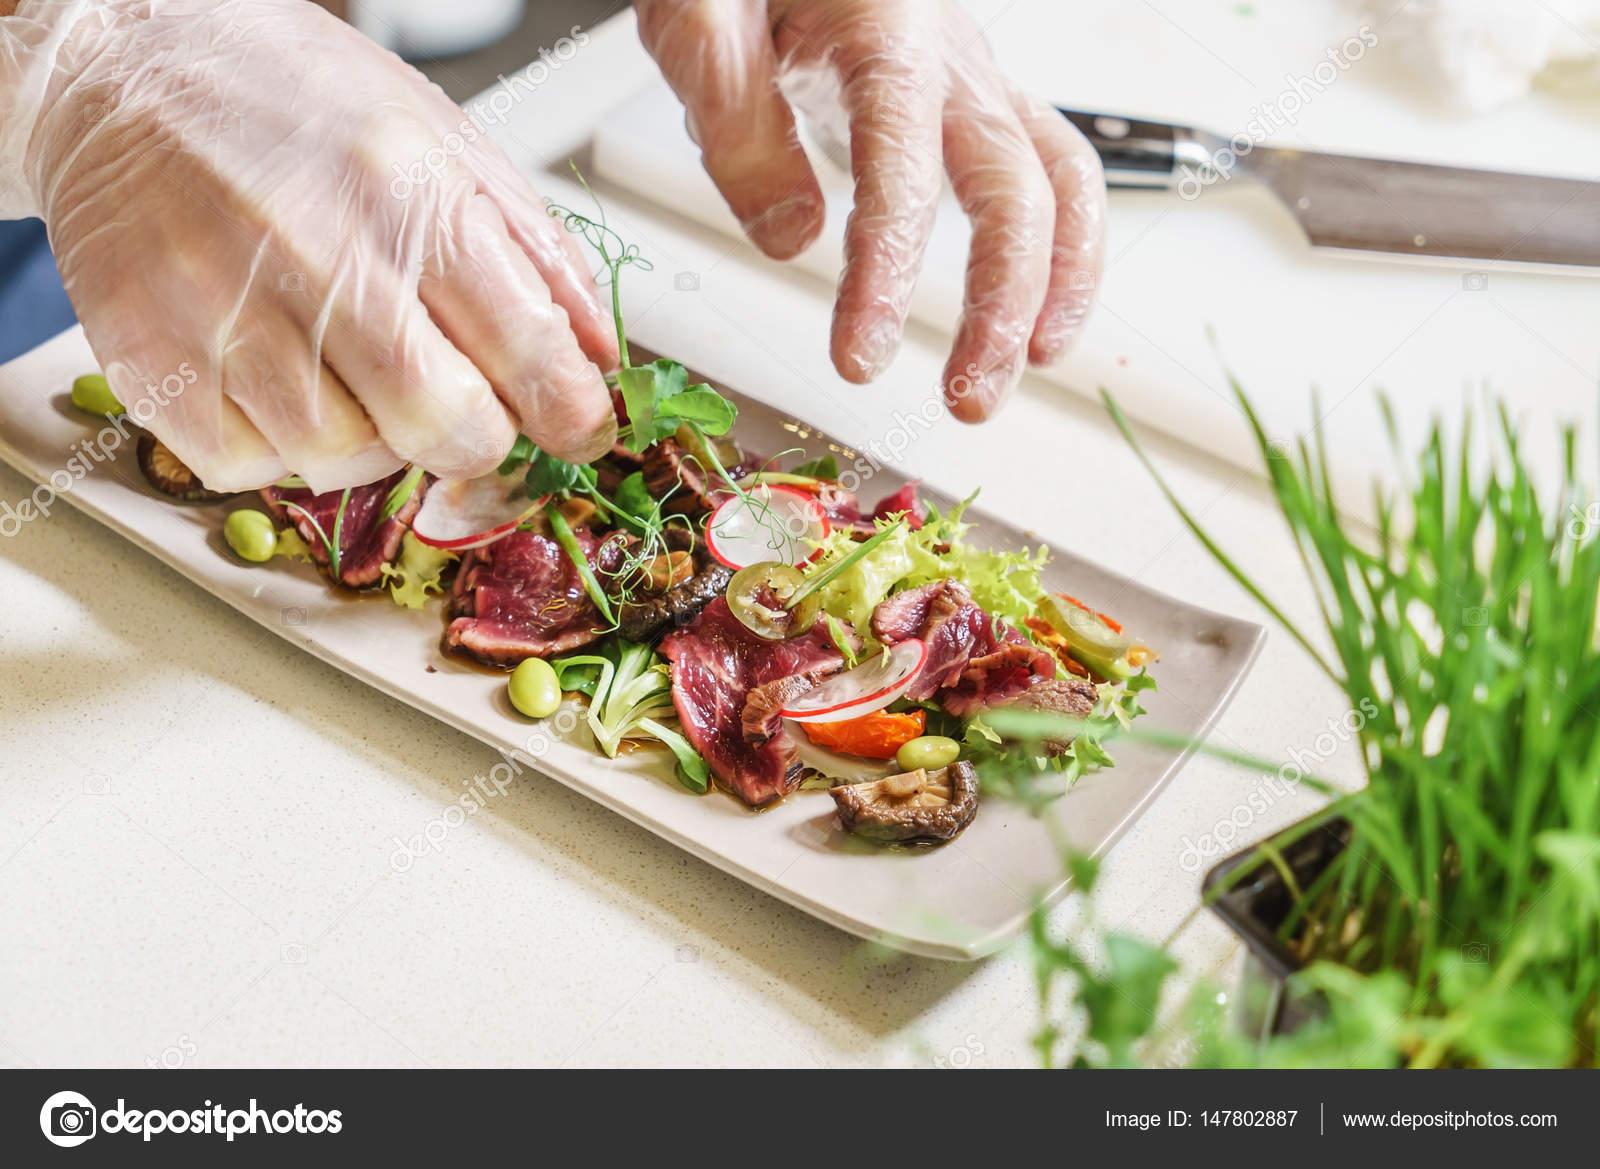 Koch machen frische Salat — Stockfoto © Shebeko #147802887